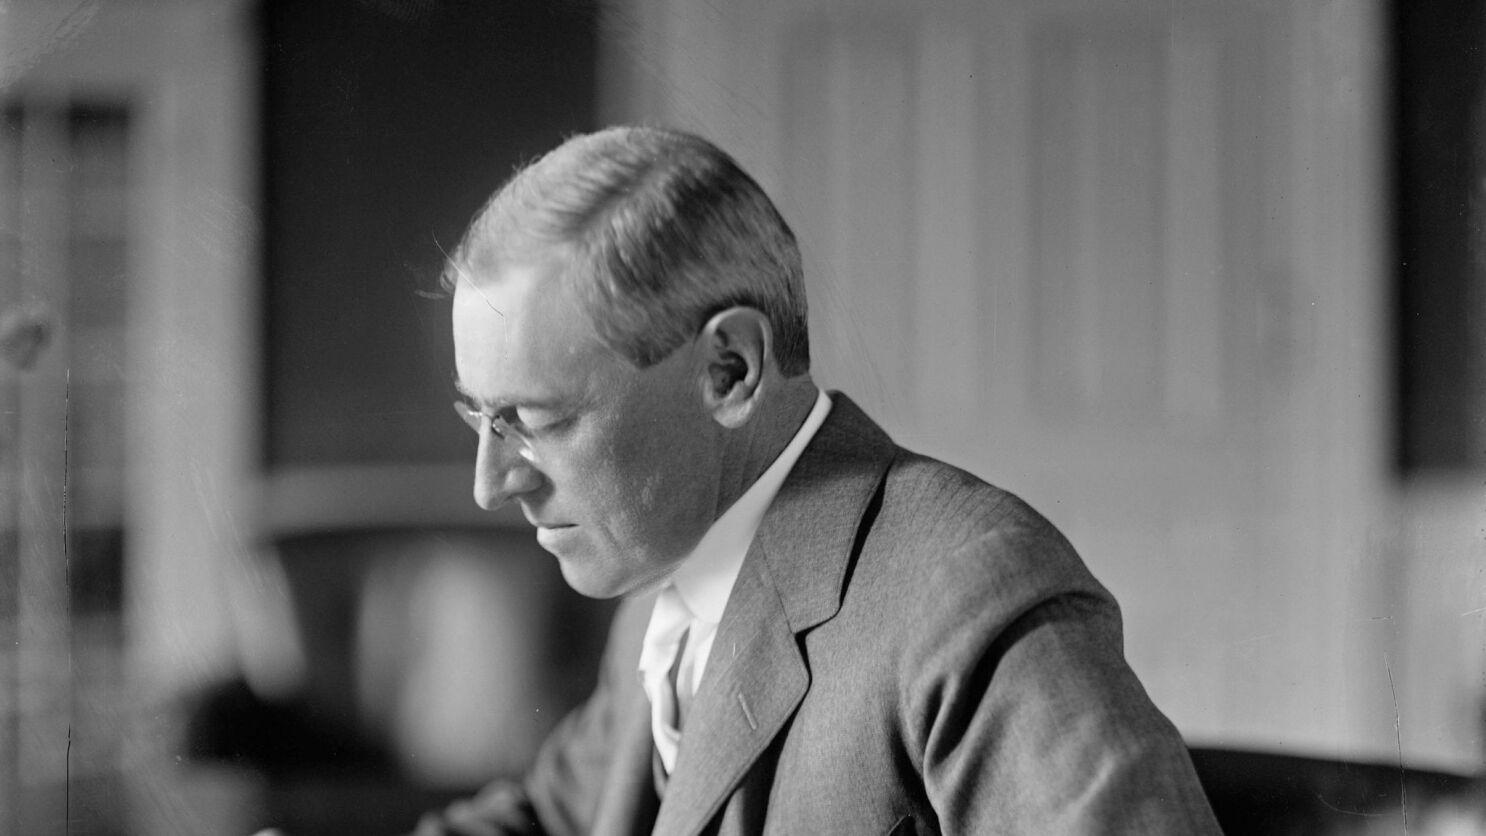 Op-Ed: 100 years ago, Woodrow Wilson fanned the flames of hate just like Trump